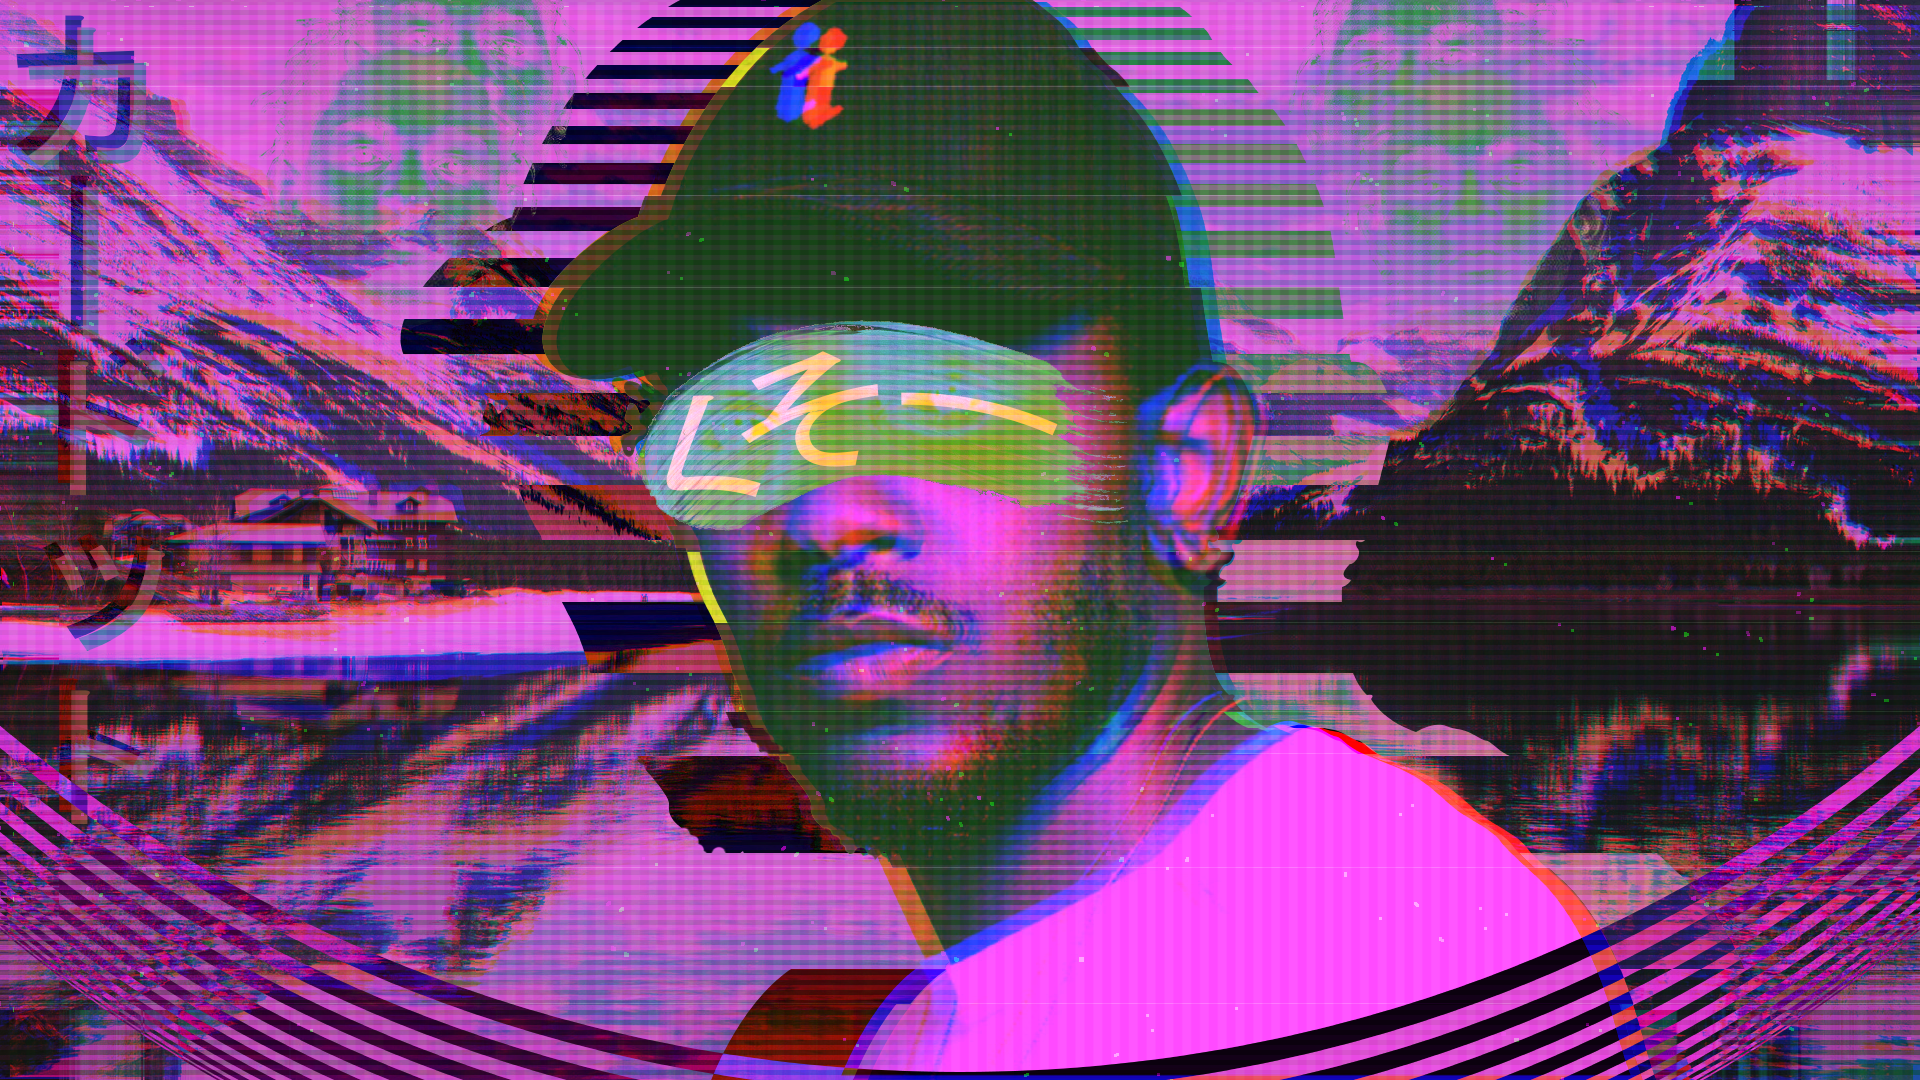 Kendrick Lamar Vaporwave Ish Wallpaper 1980x1080 Oc Laptop Wallpaper Vaporwave Art Art Wallpaper